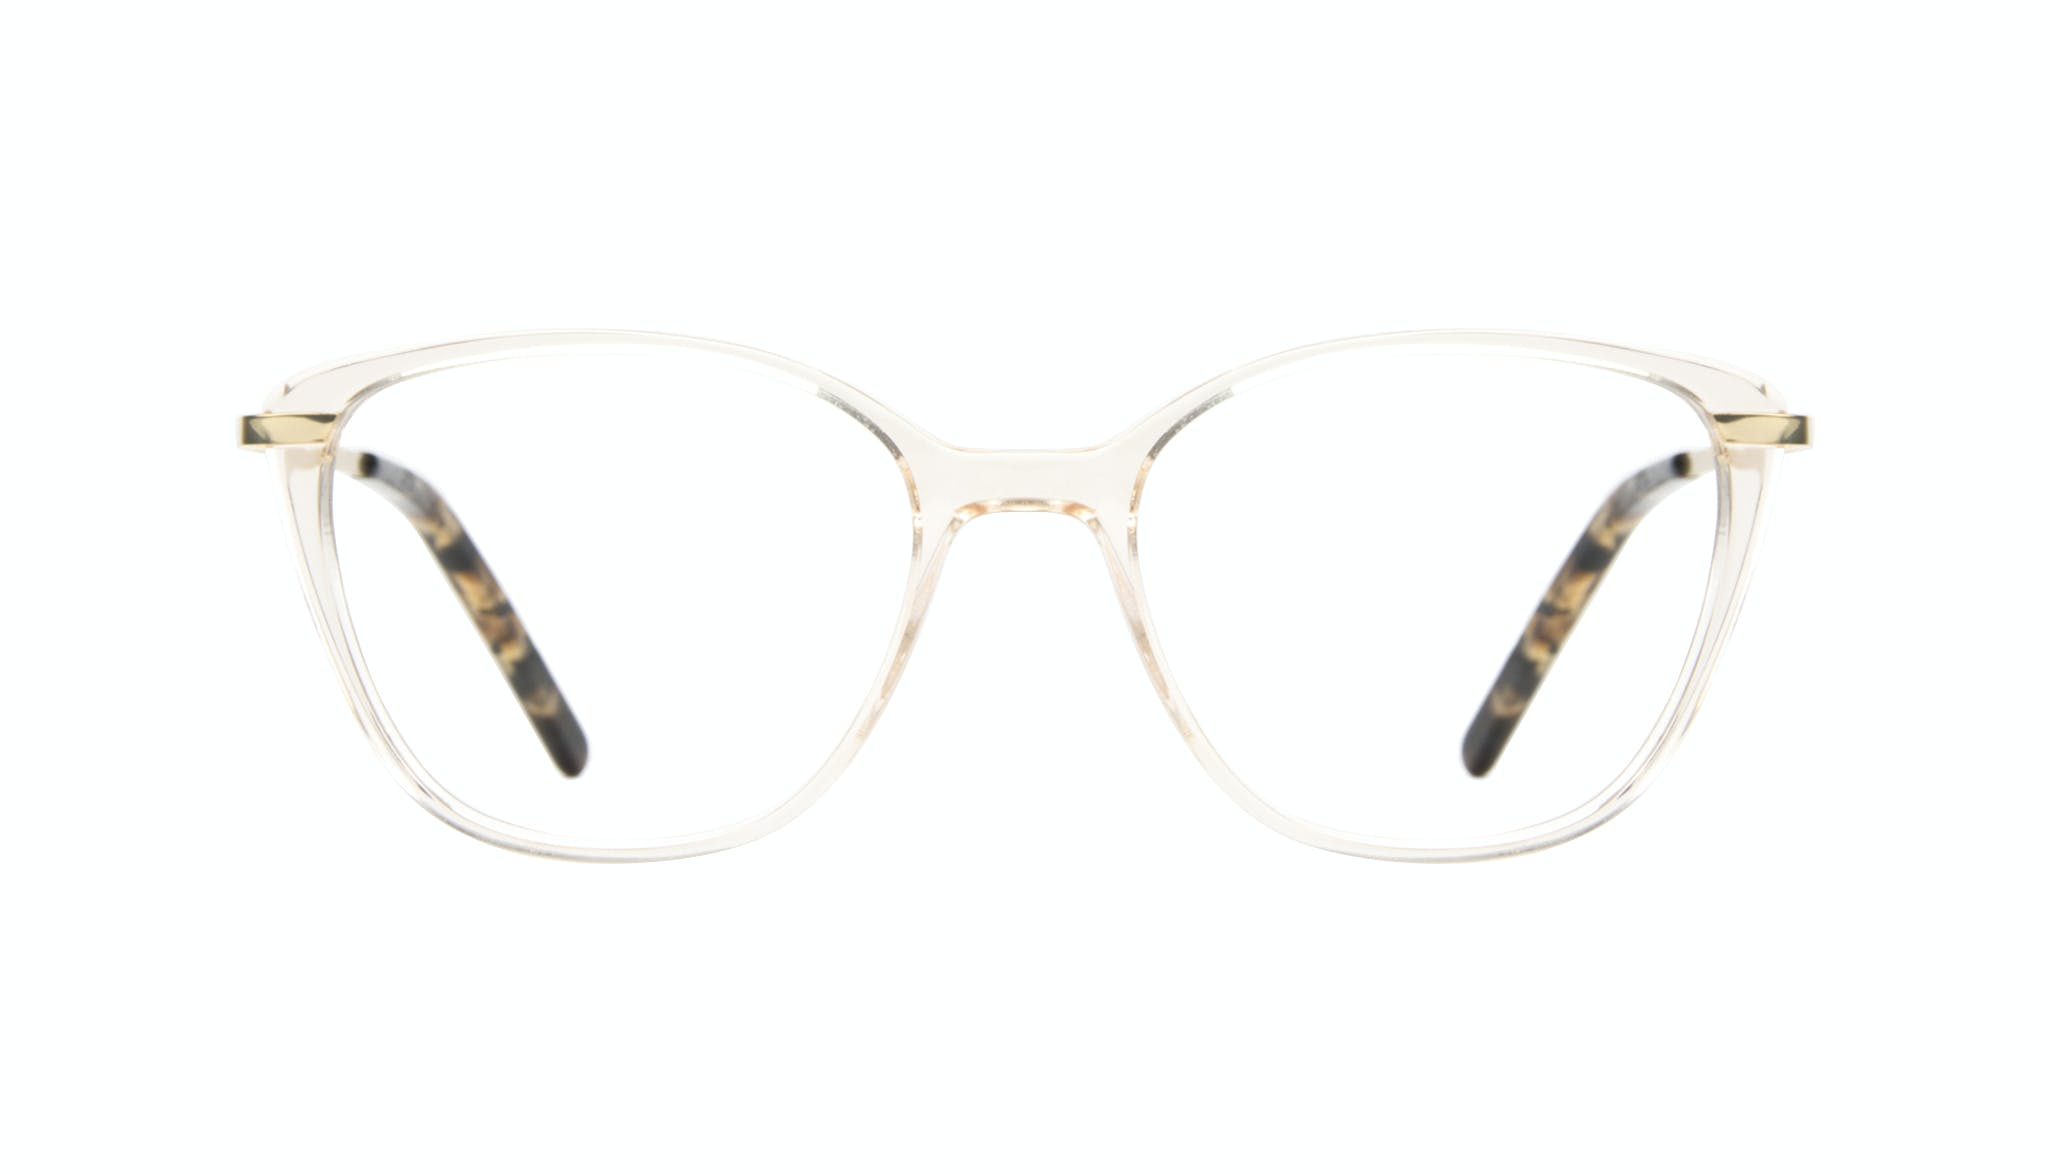 Affordable Fashion Glasses Cat Eye Rectangle Square Eyeglasses Women Illusion Blond Metal Front